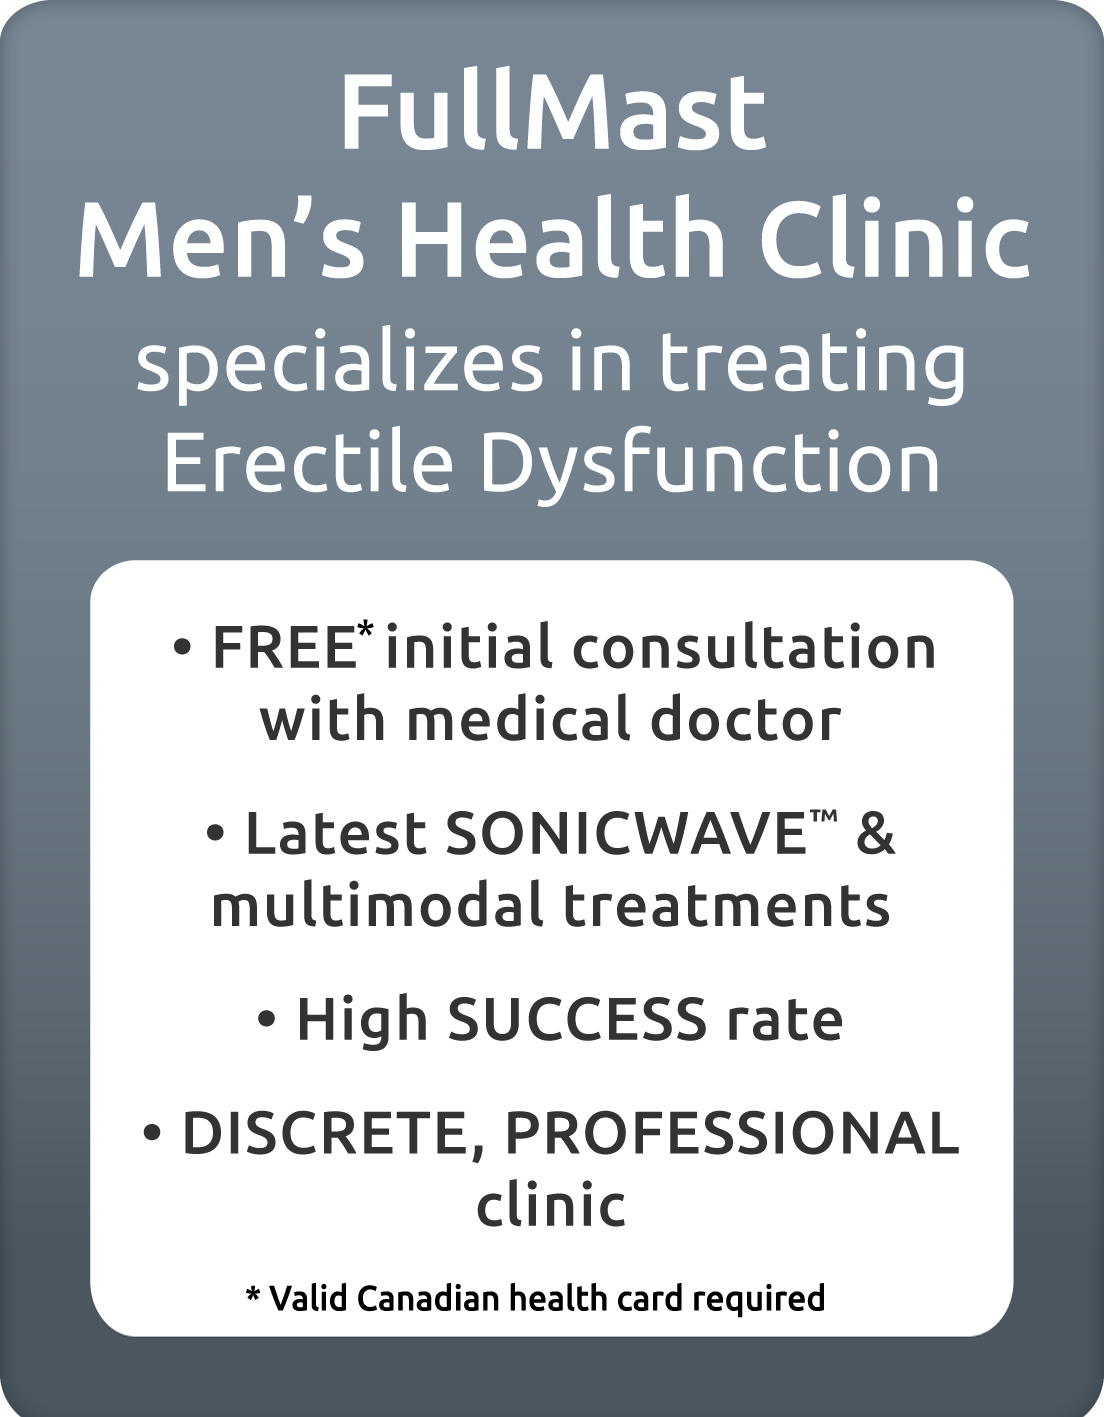 FullMast Men's Health Clinic